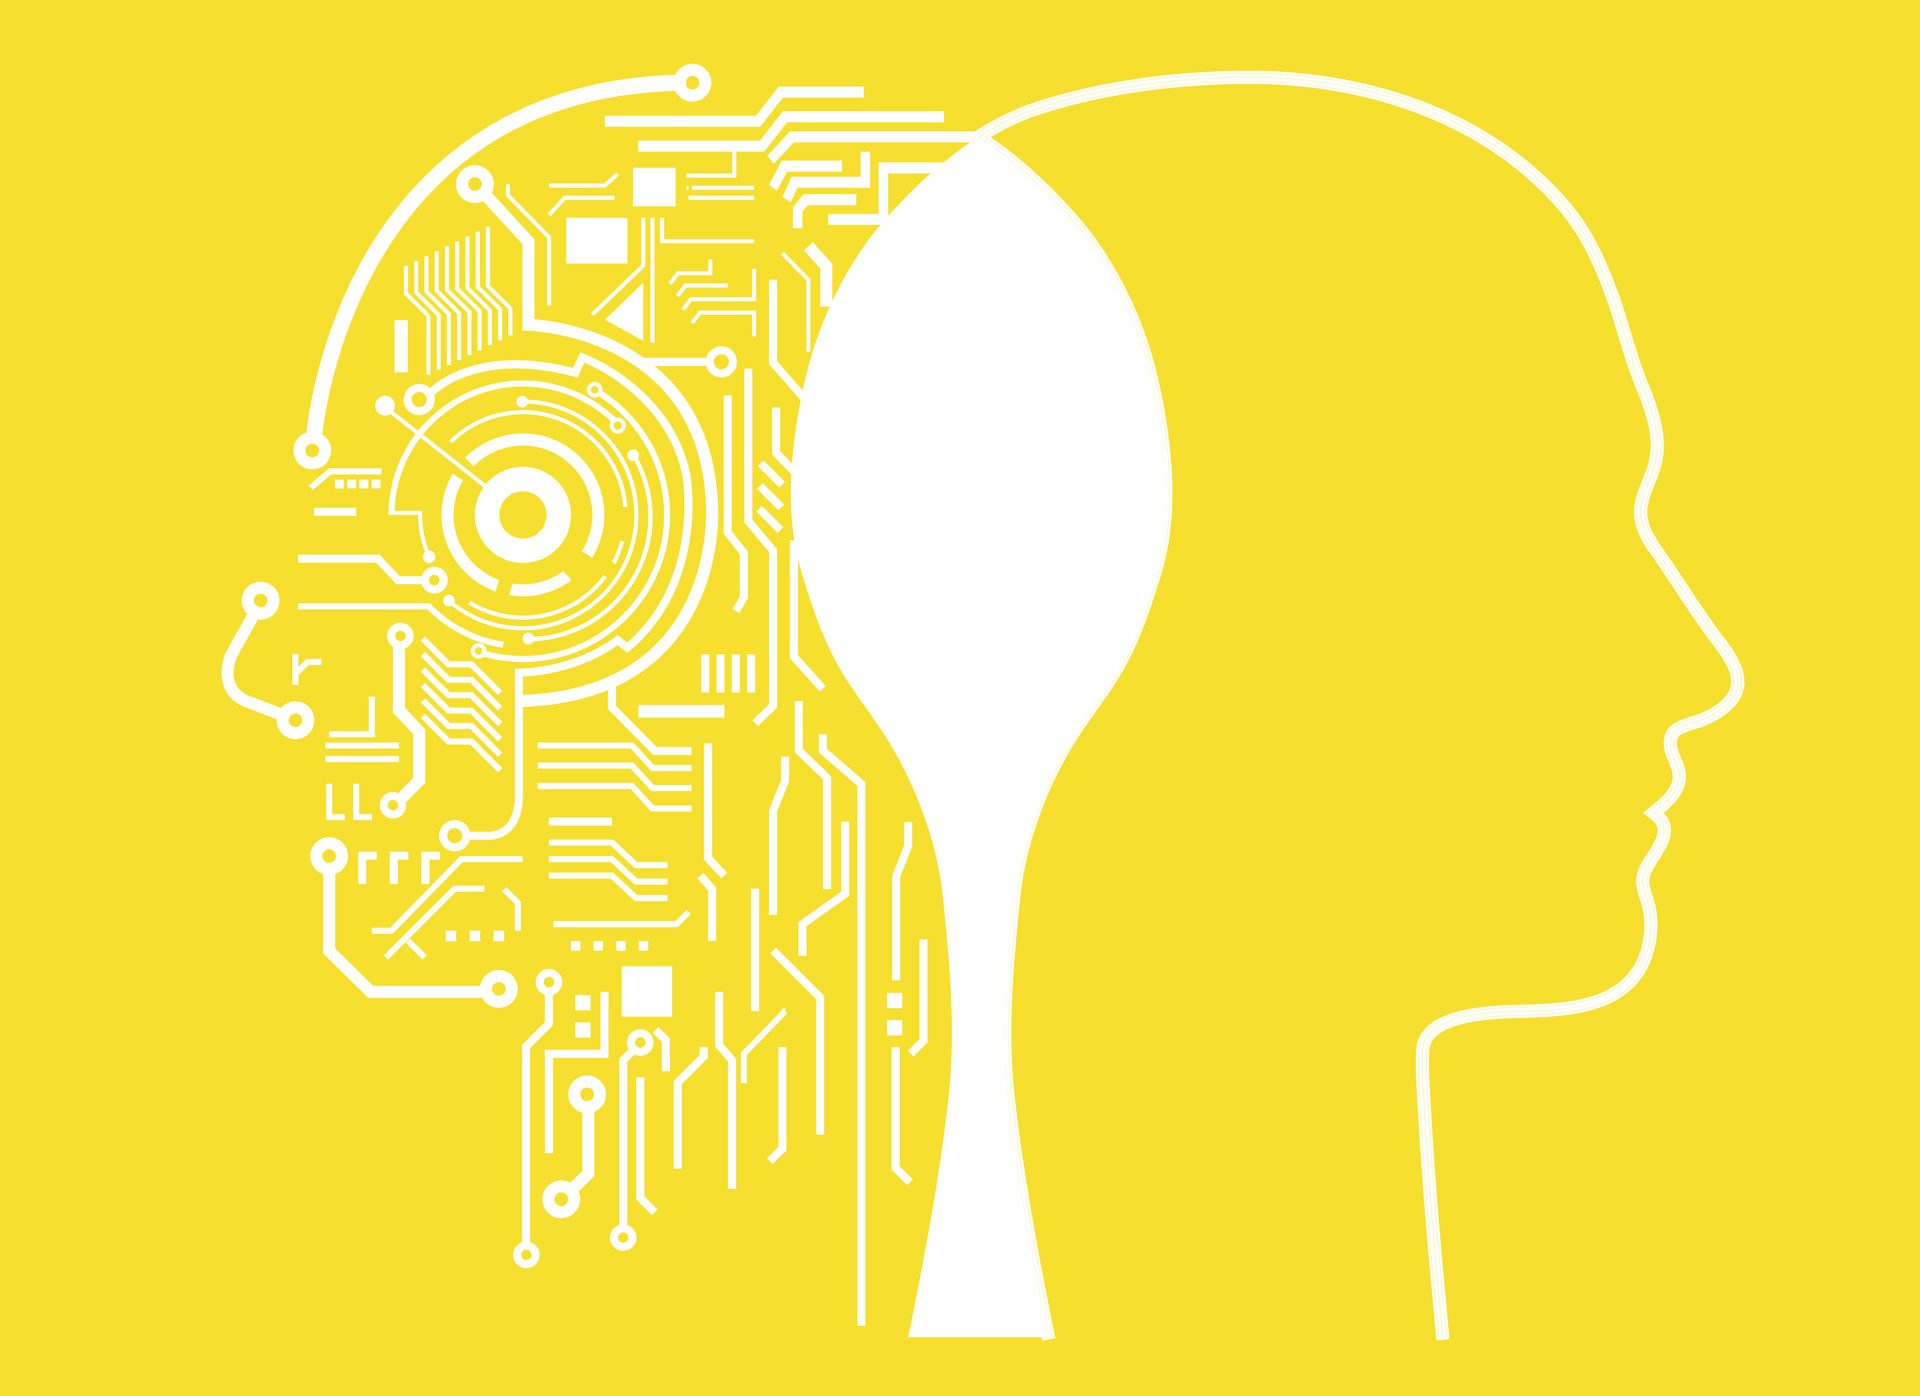 Element AI nets £123m to advance enterprise artificial intelligence